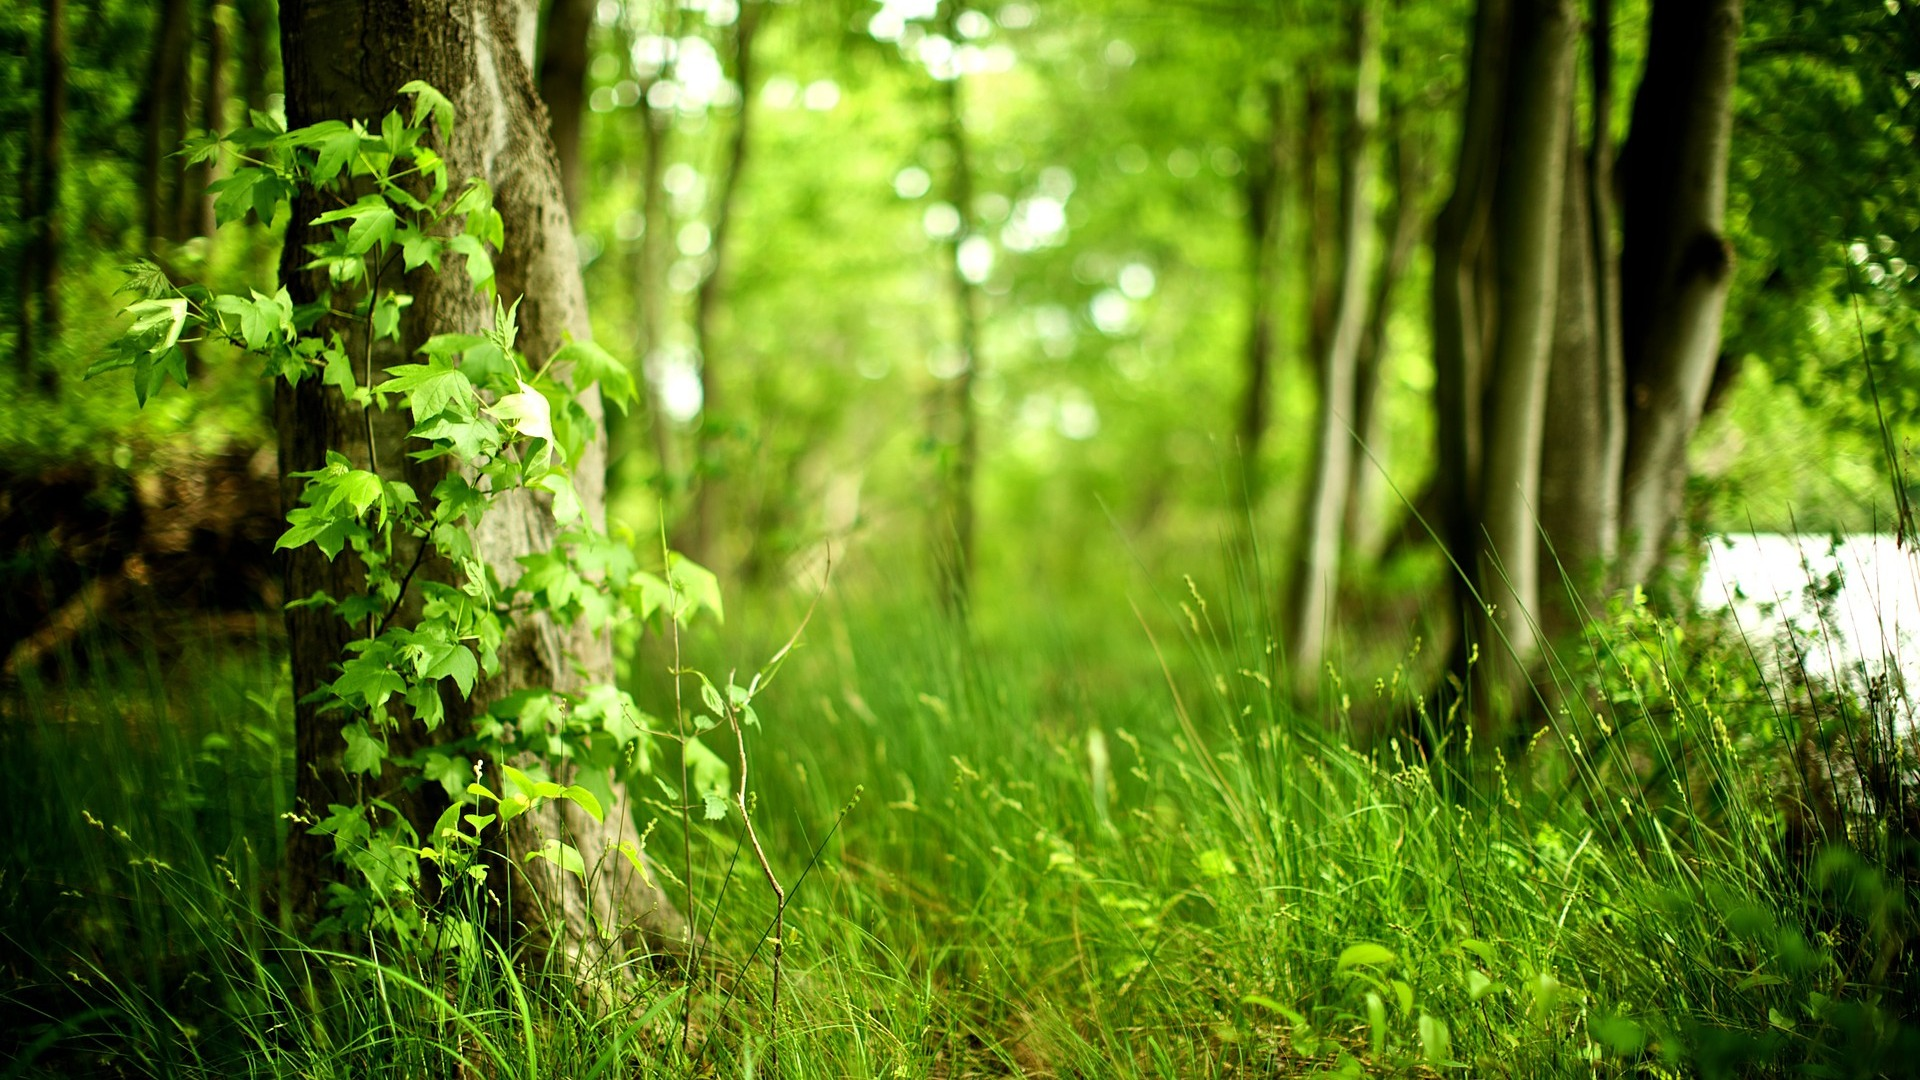 Green Woods Nature Photography Wallpaper Wallpaper